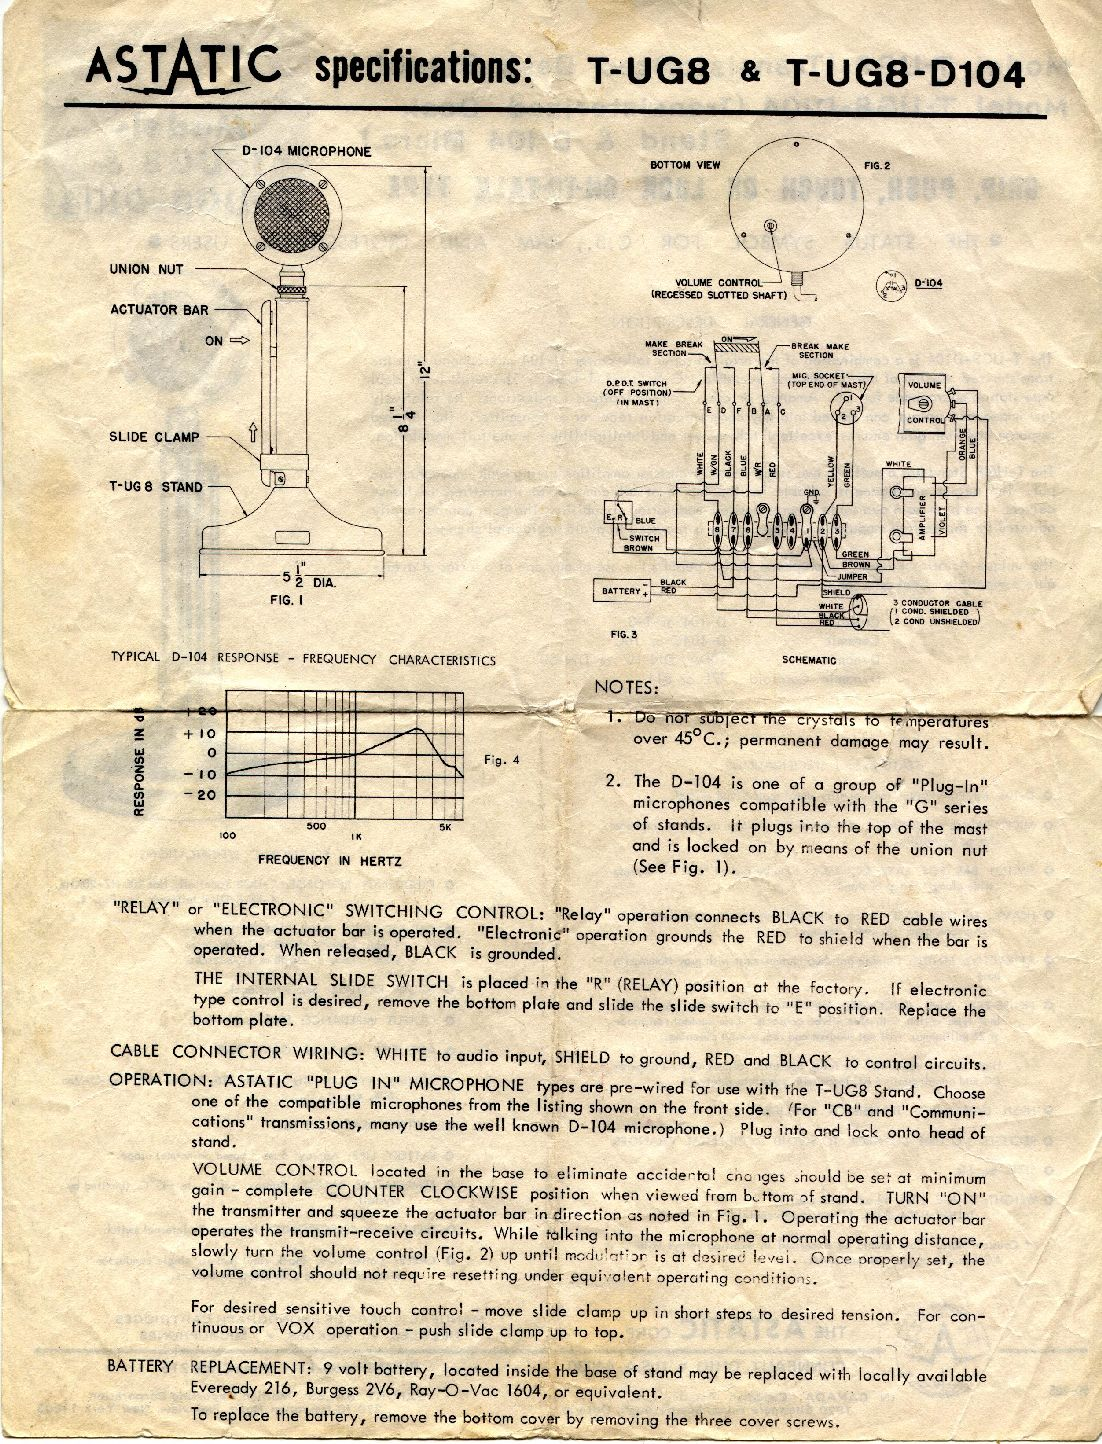 astatic d104m6b wiring diagram schematics wiring diagrams u2022 rh seniorlivinguniversity co Astatic D-104 Microphone Wiring Diagram Astatic Silver Eagle Wiring-Diagram